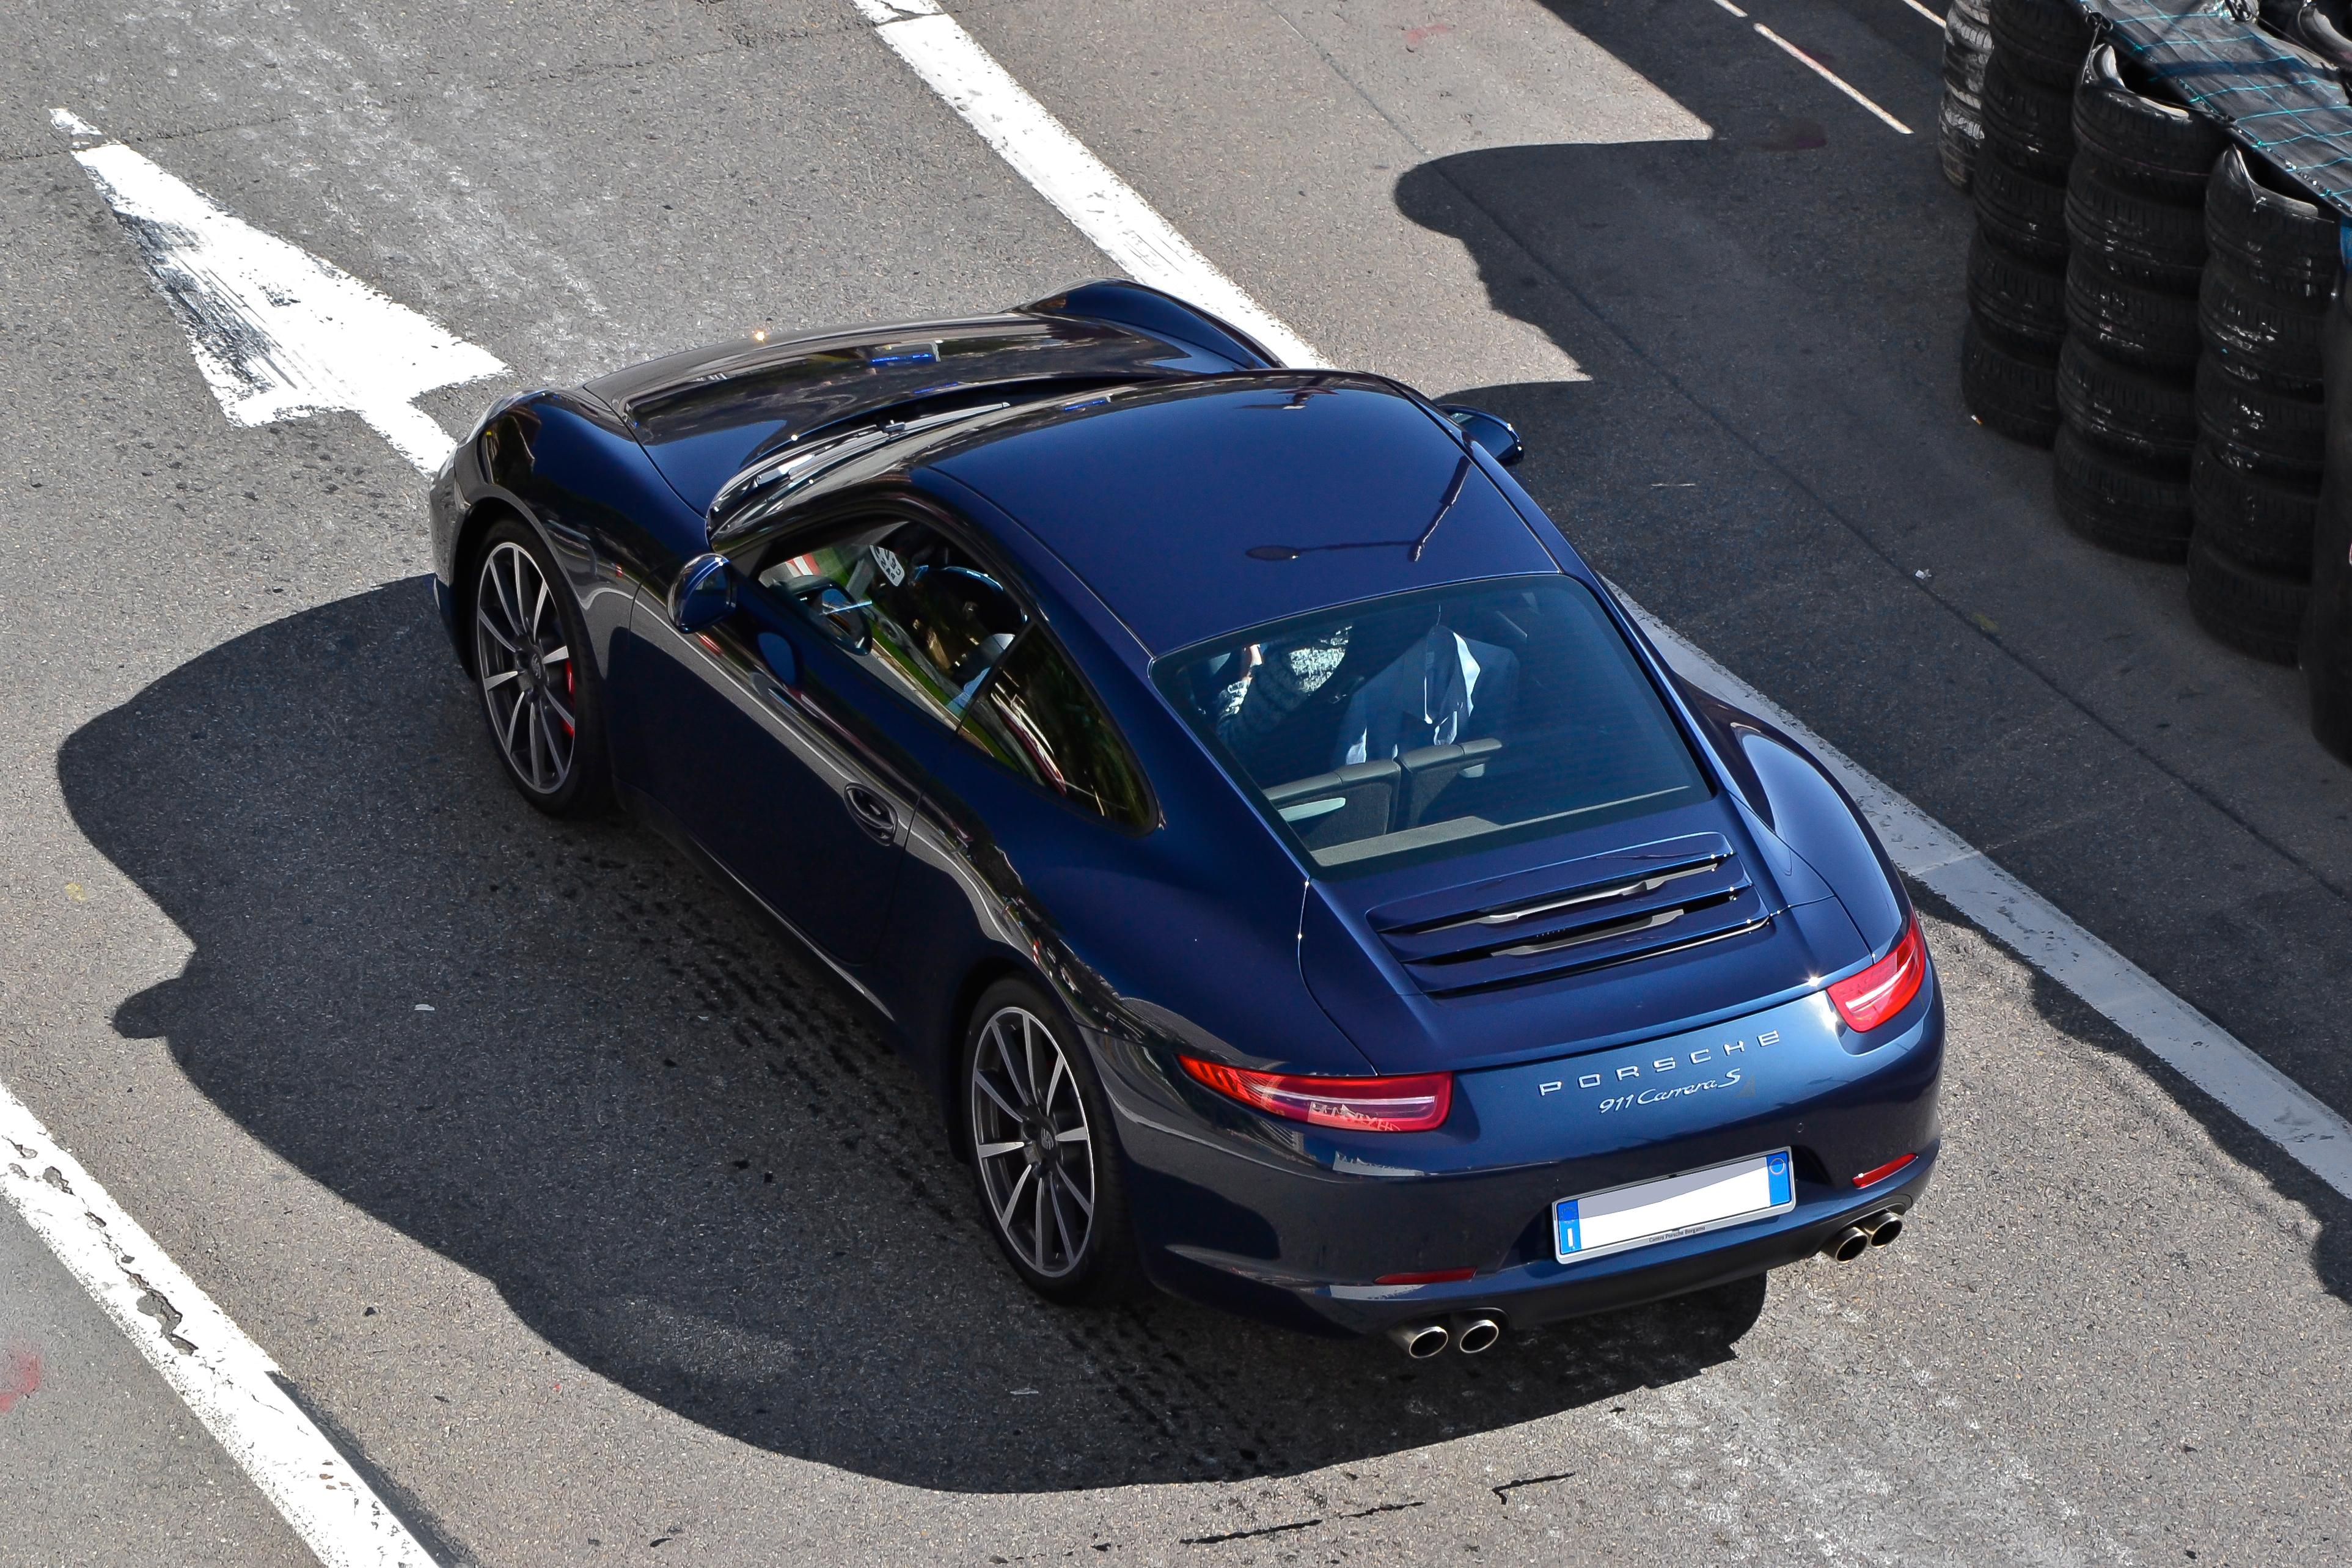 File Porsche 911 Carrera S 7169535696 Jpg Wikimedia